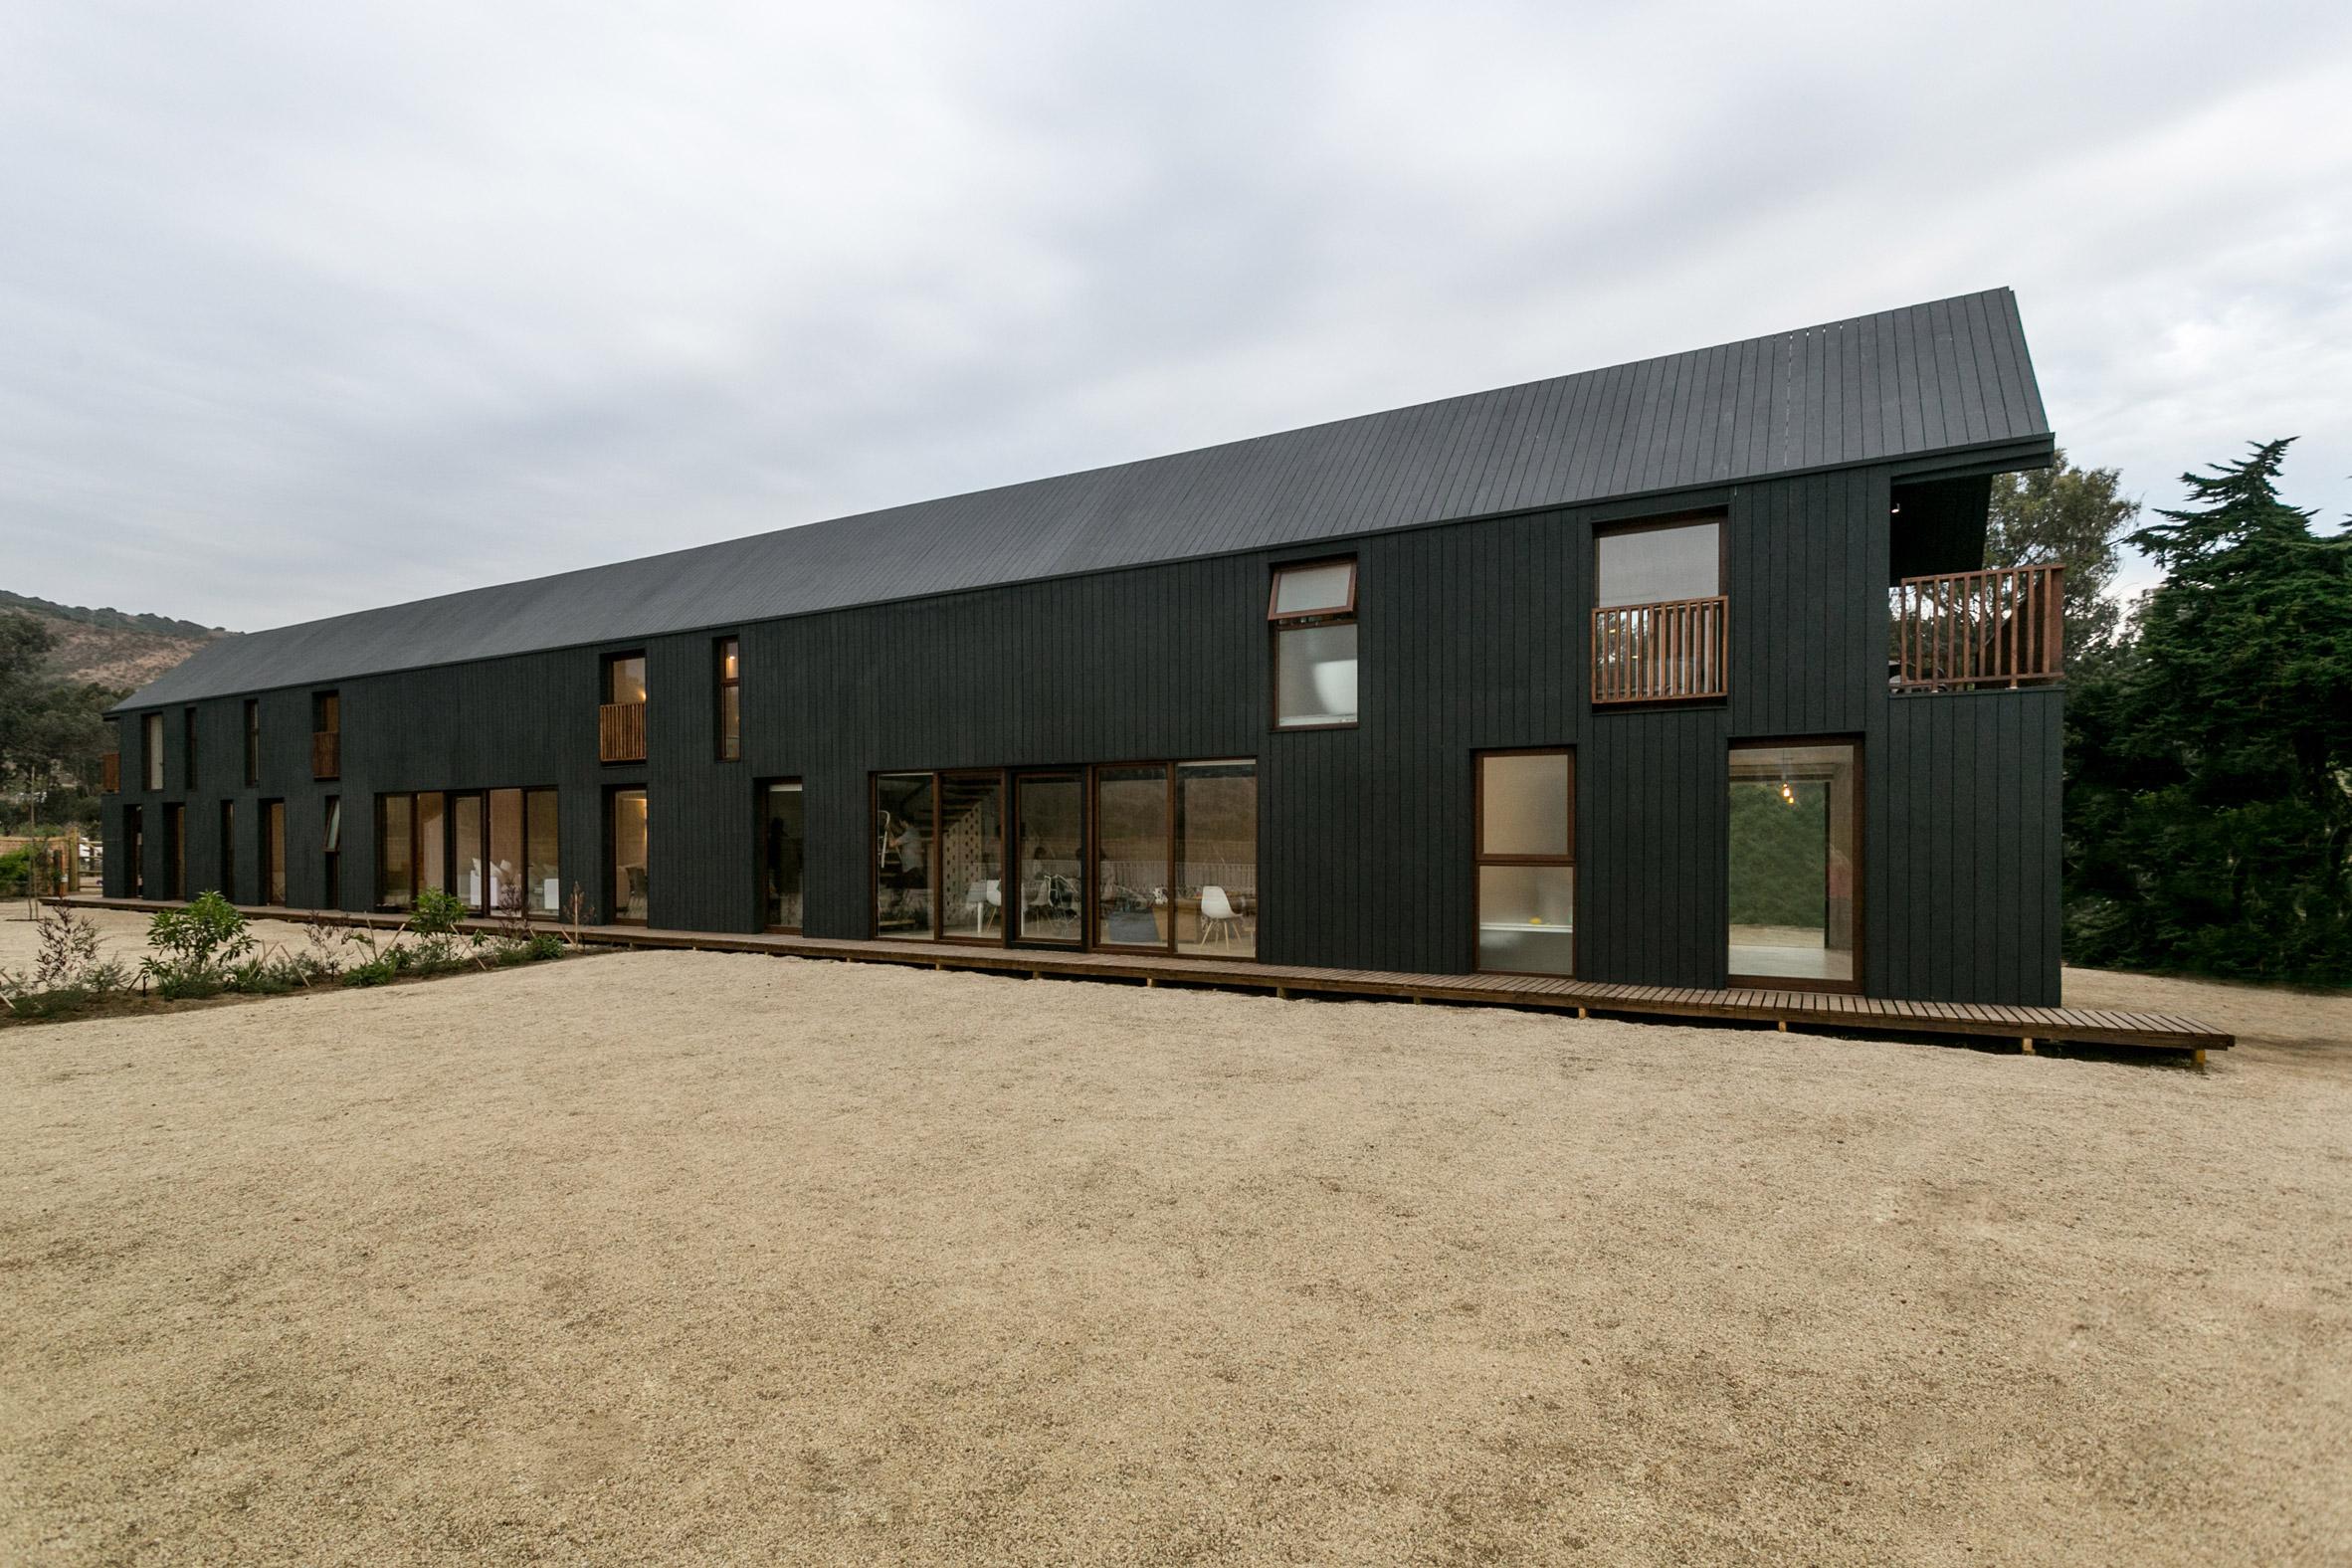 shotgun-house-alejandro-soffia-architecture-black-wood-chile_dezeen_2364_col_13.jpg